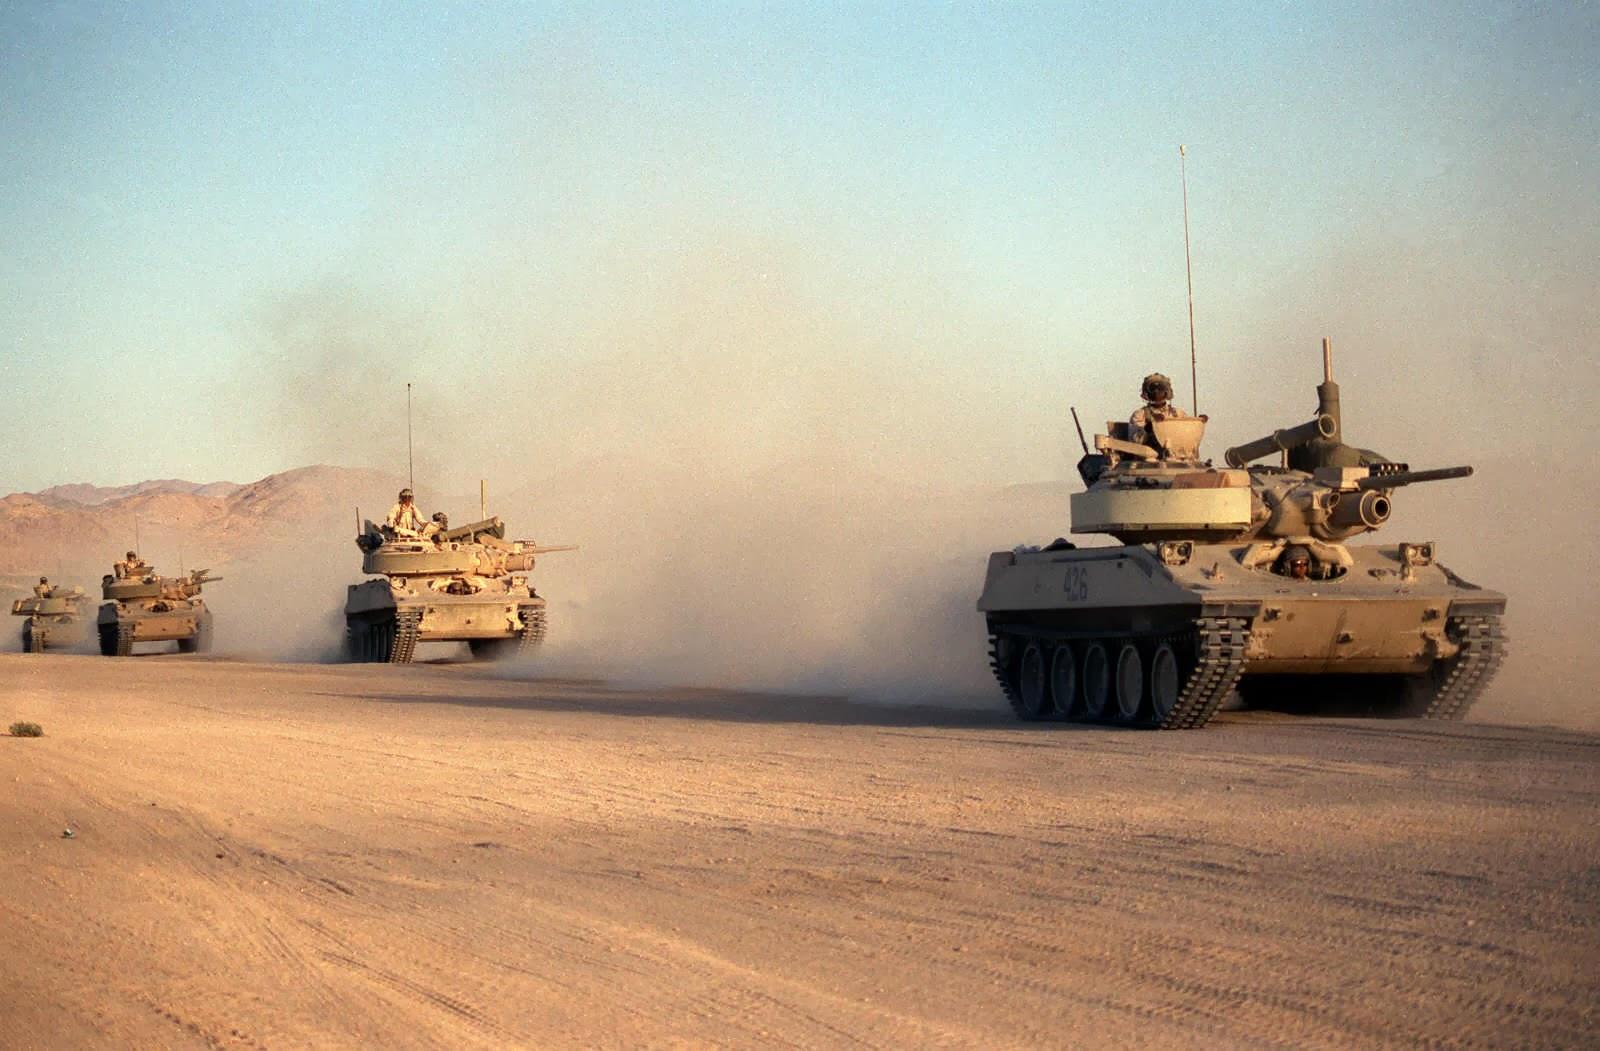 world of tanks nexus 7